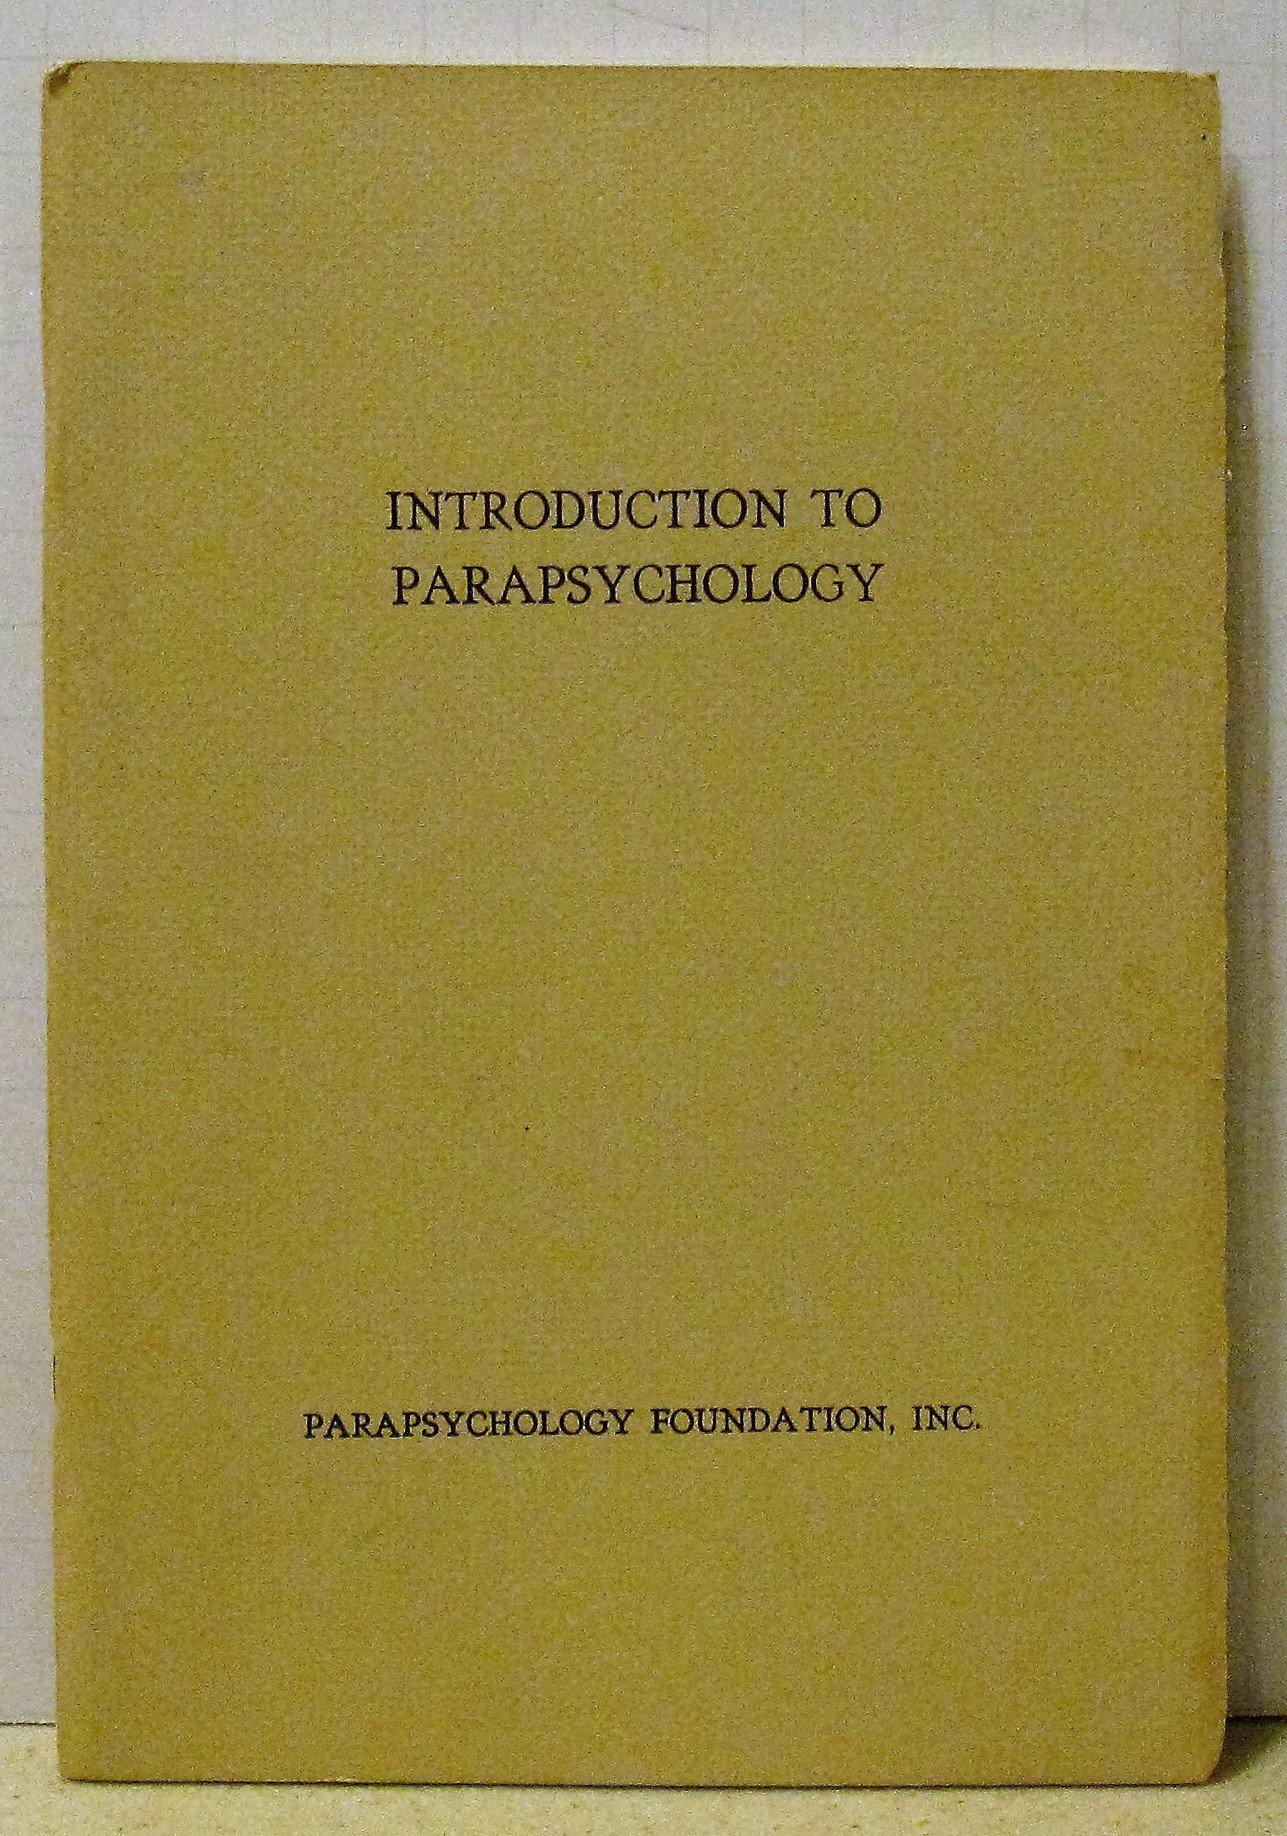 parapsychology foundation